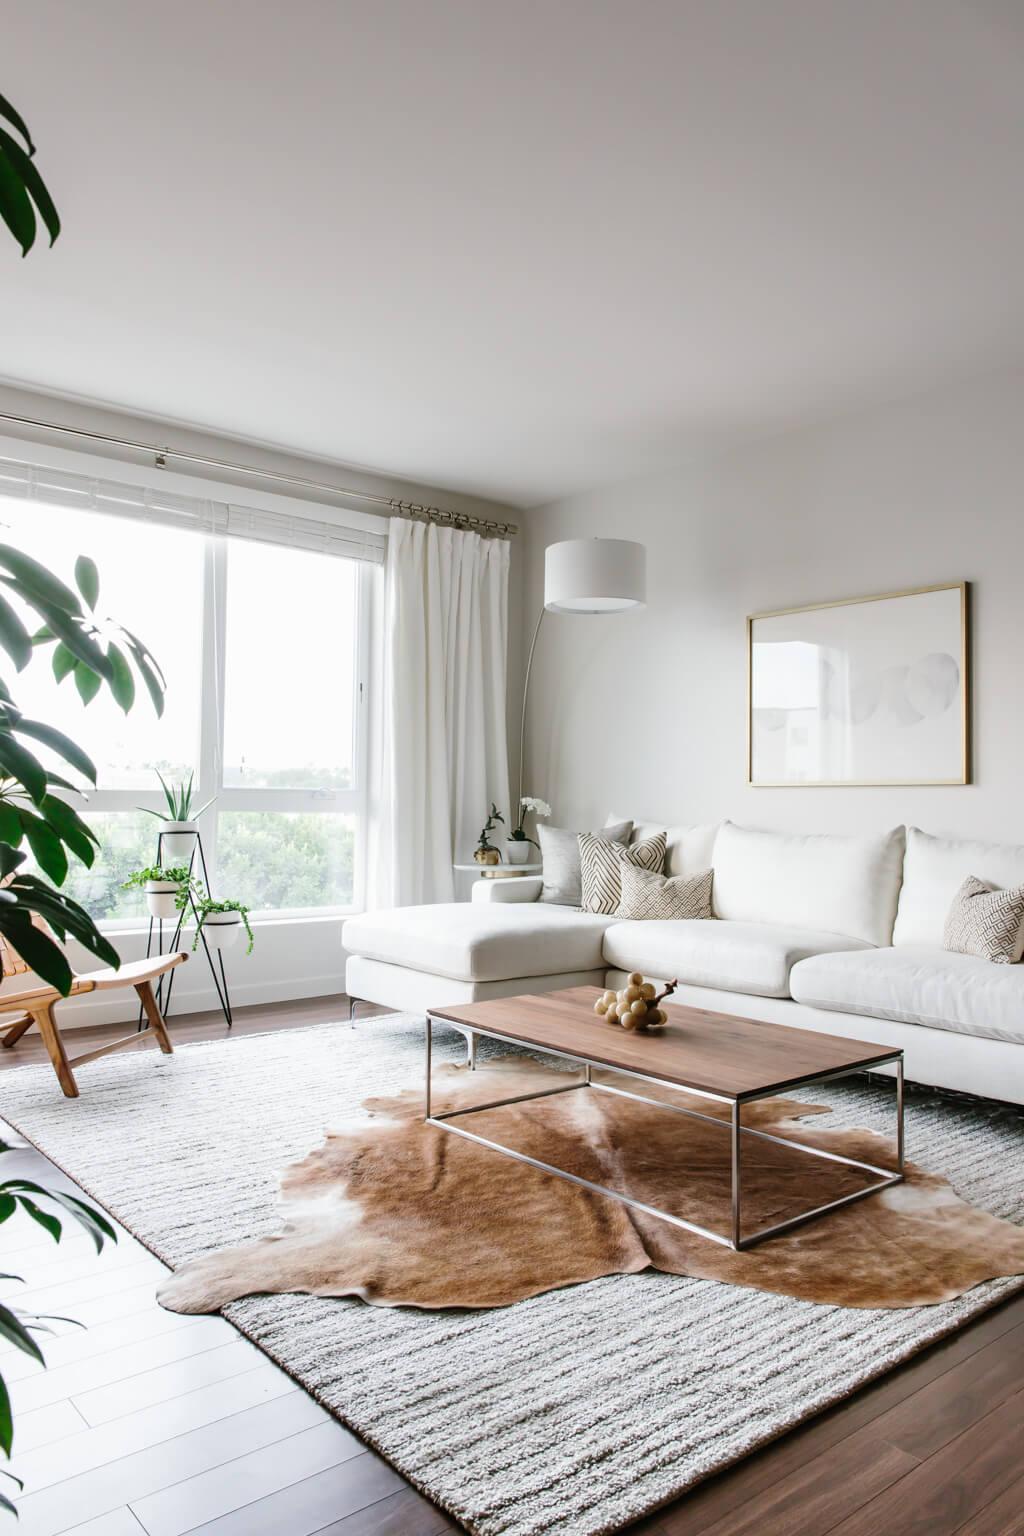 Designing my Modern and Minimalist Living Room with ... on Minimalist Living Room Design  id=50907